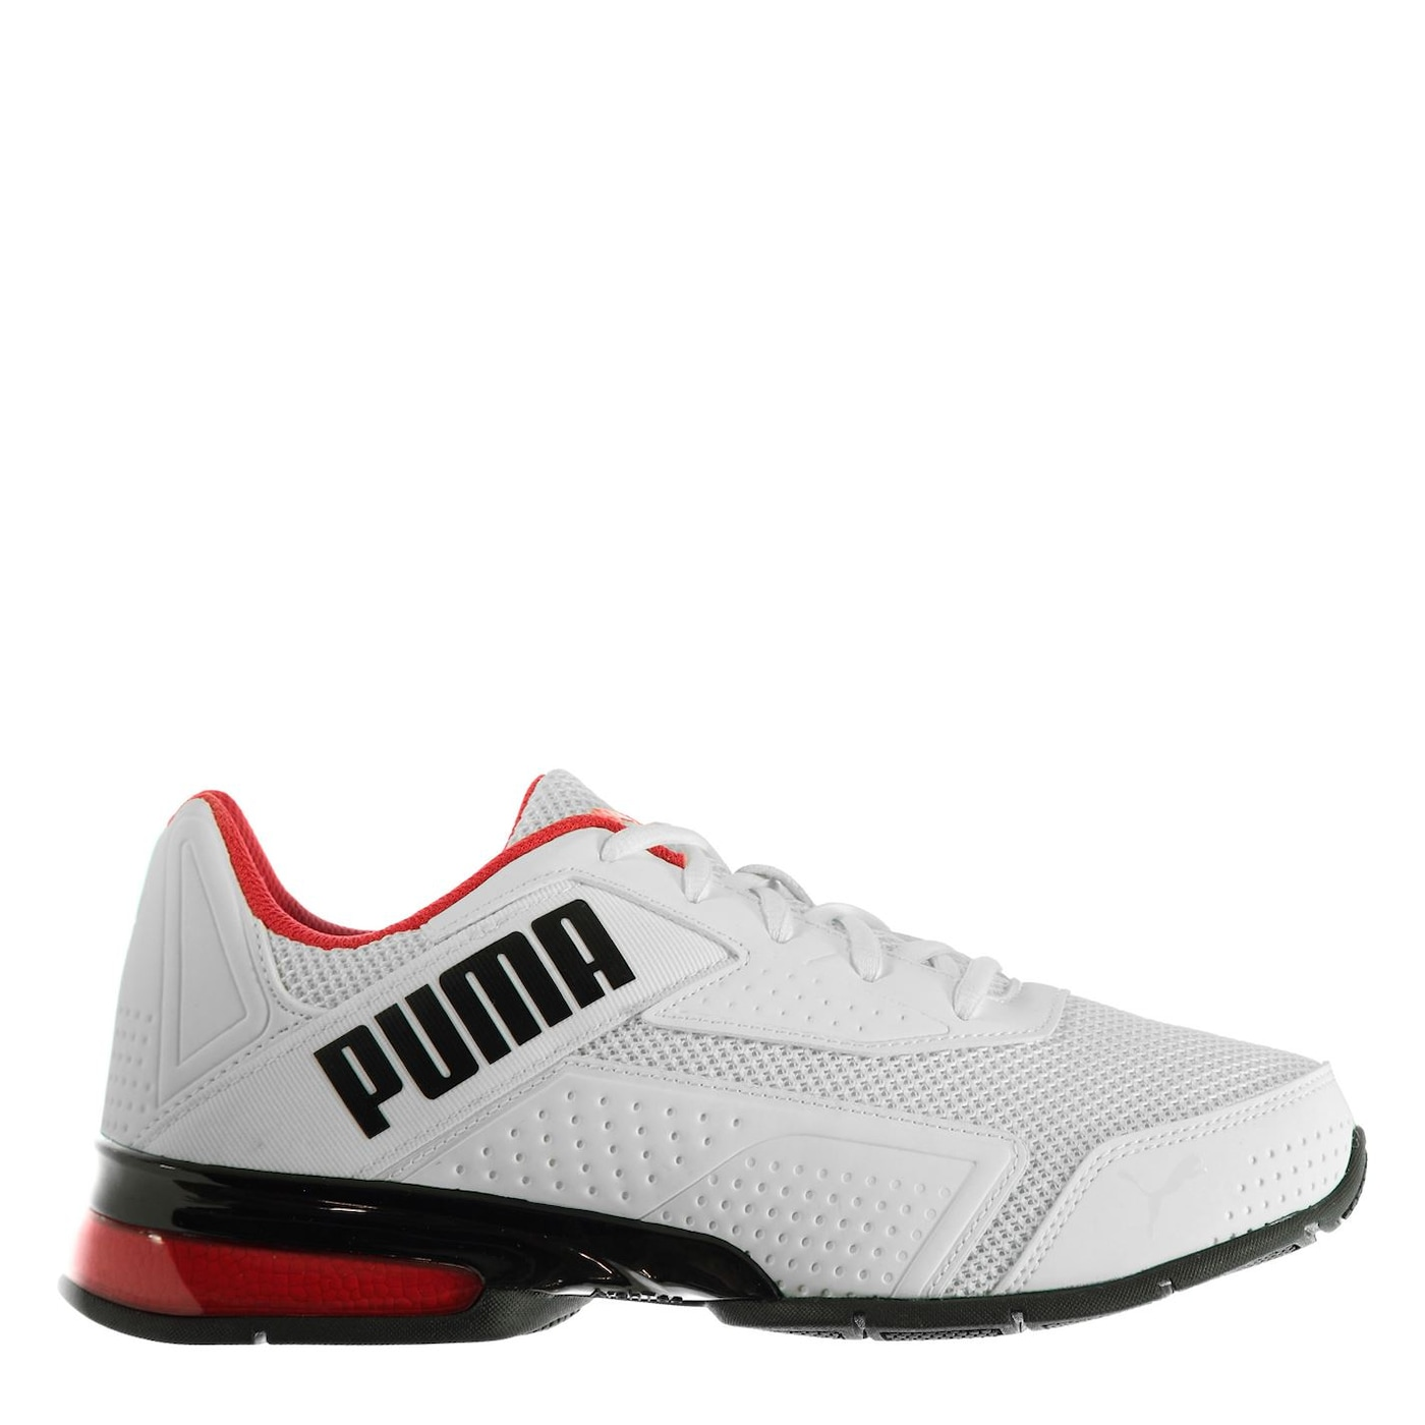 Pánske tenisky Puma Leader VT Nubuck